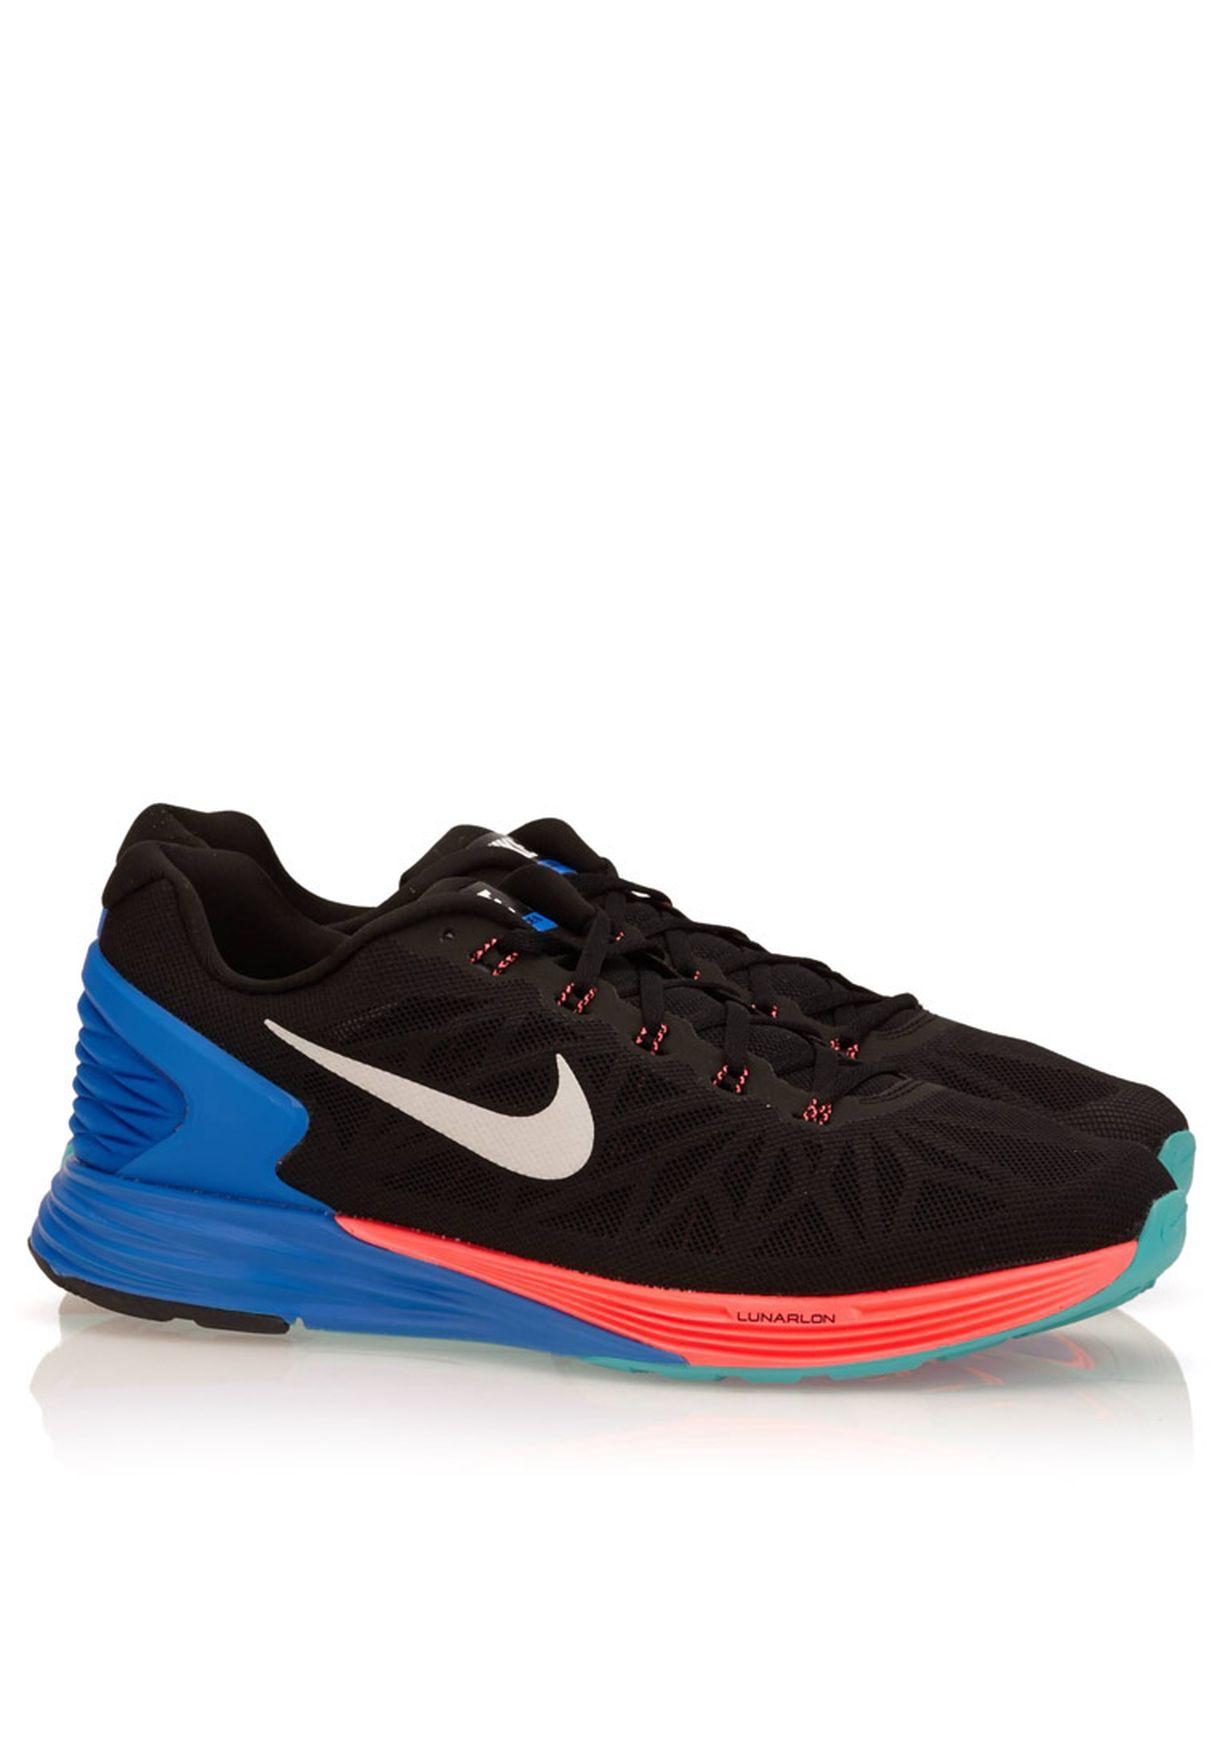 6c4199ceb184f Shop Nike multicolor Lunarglide 6 654433-002 for Men in UAE ...